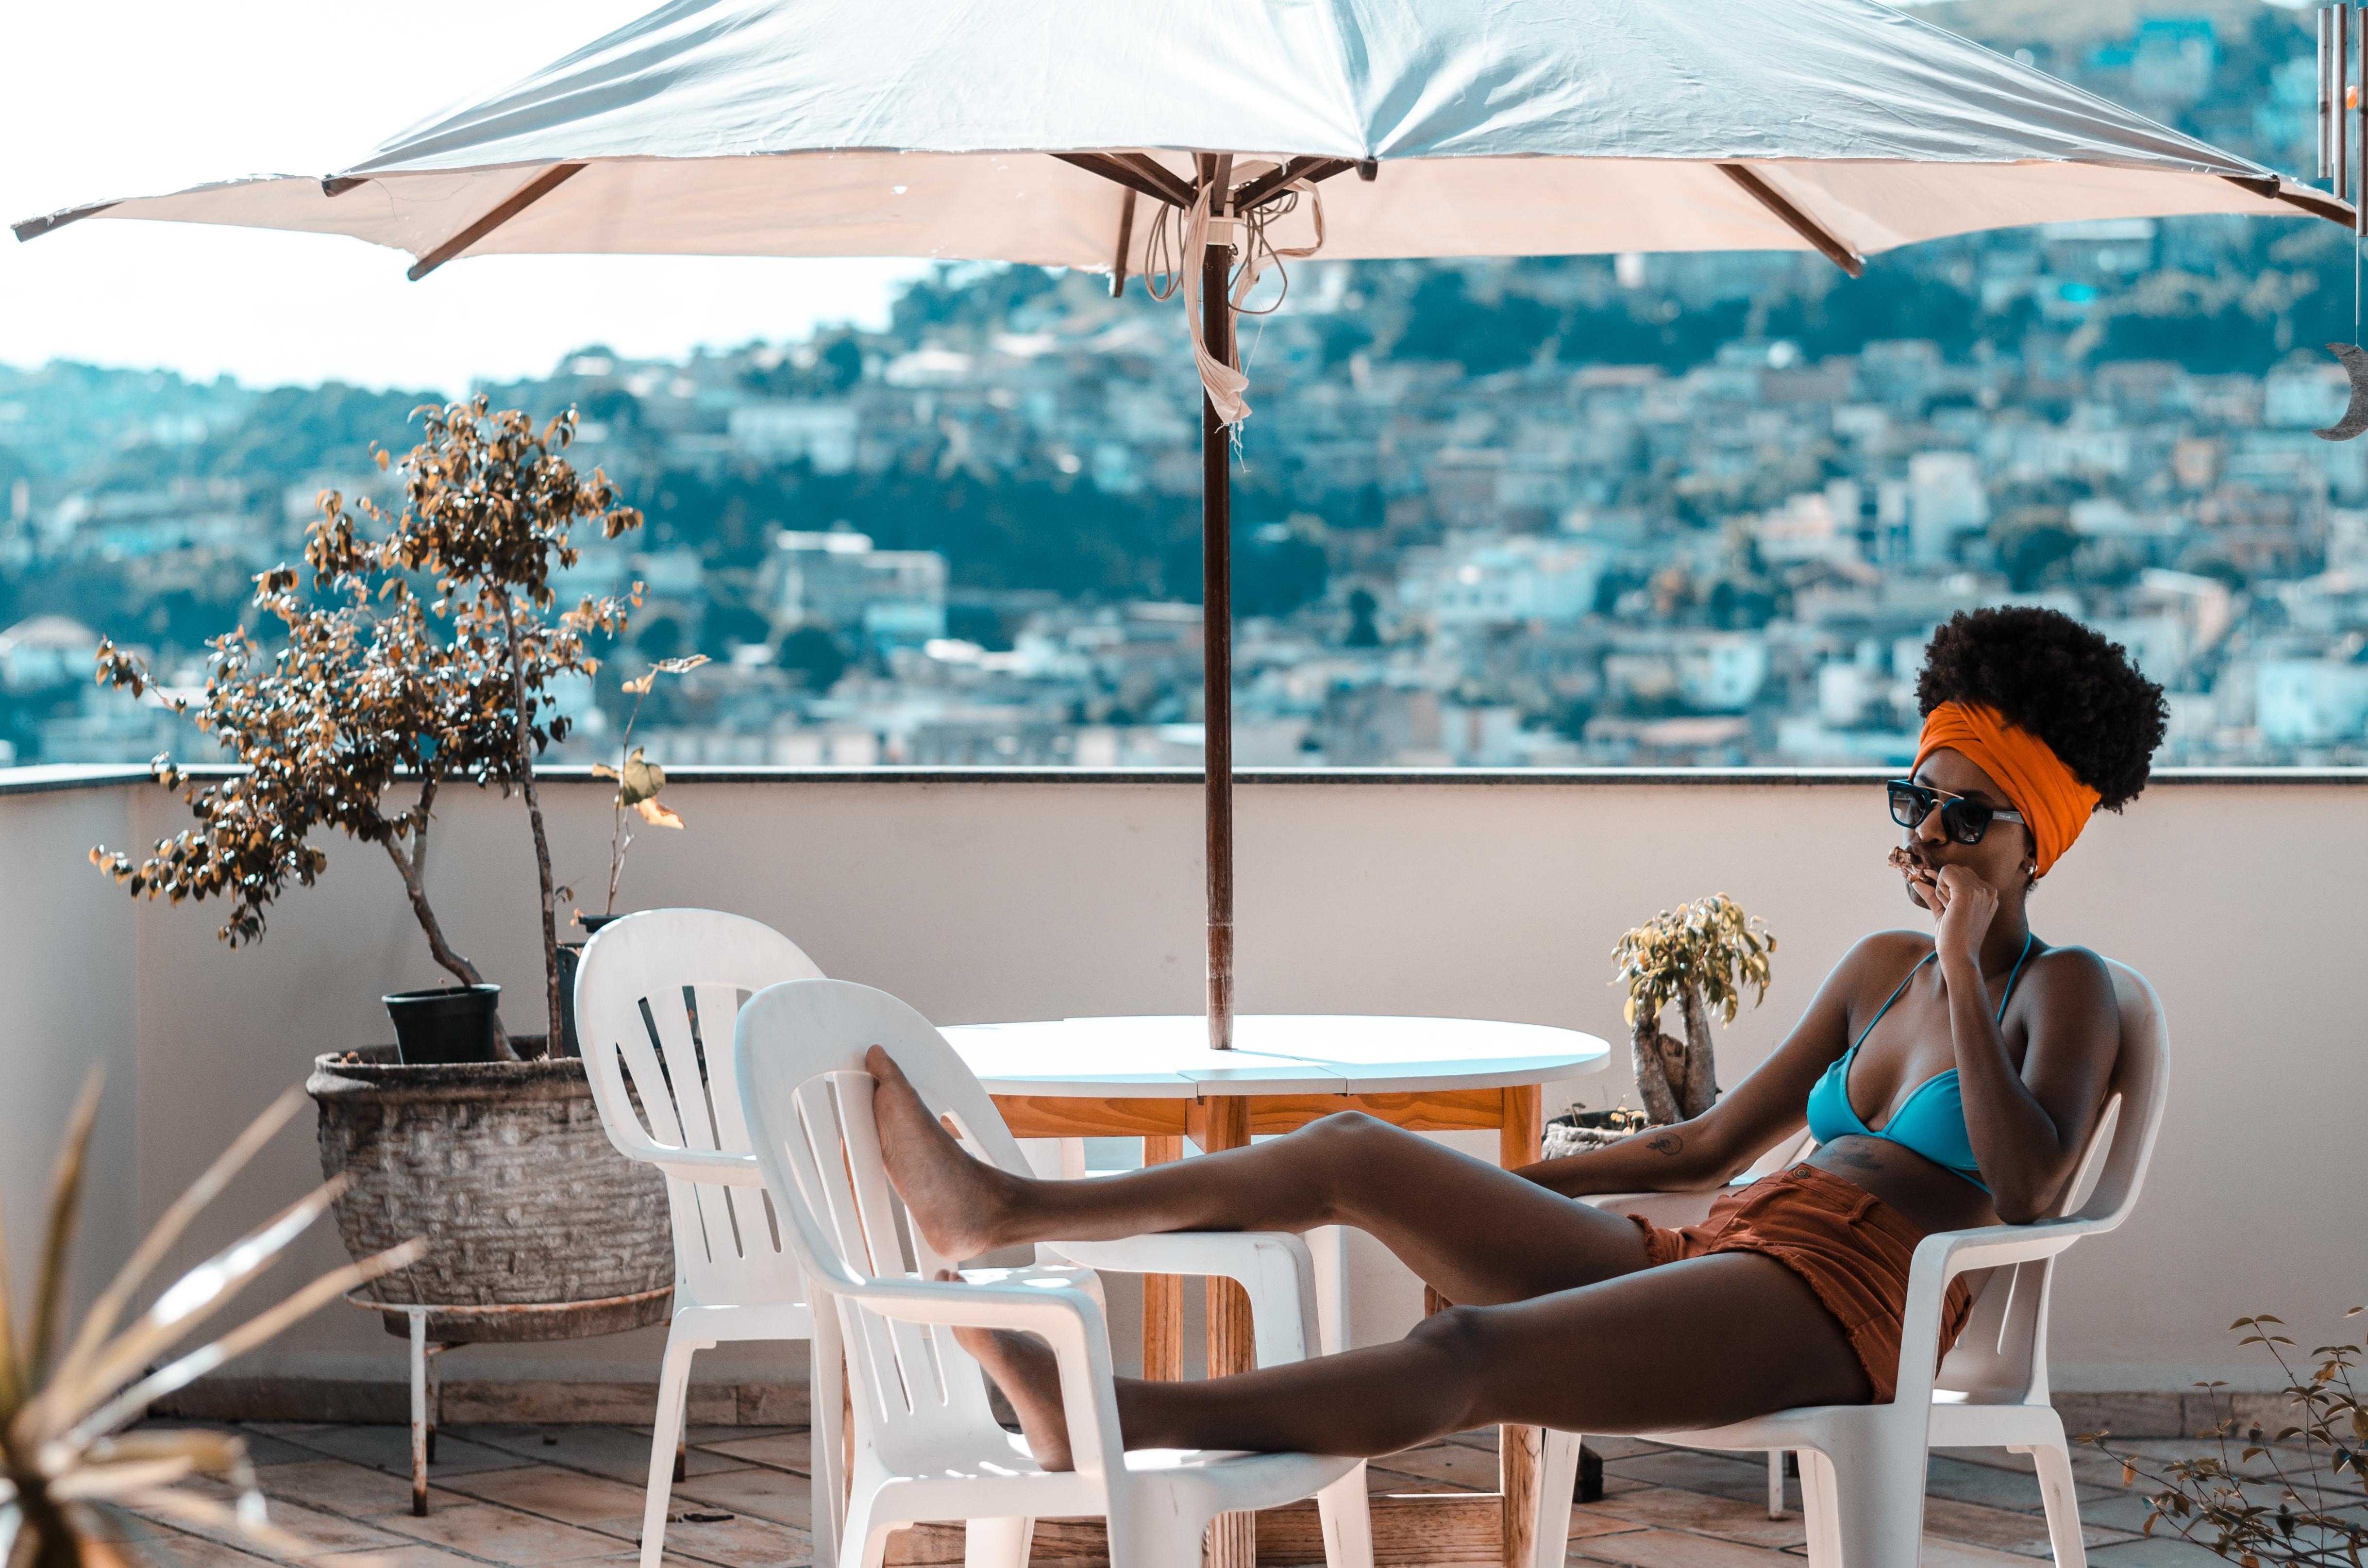 5 Ways Millennials Can Save Money For The Next Big Trip